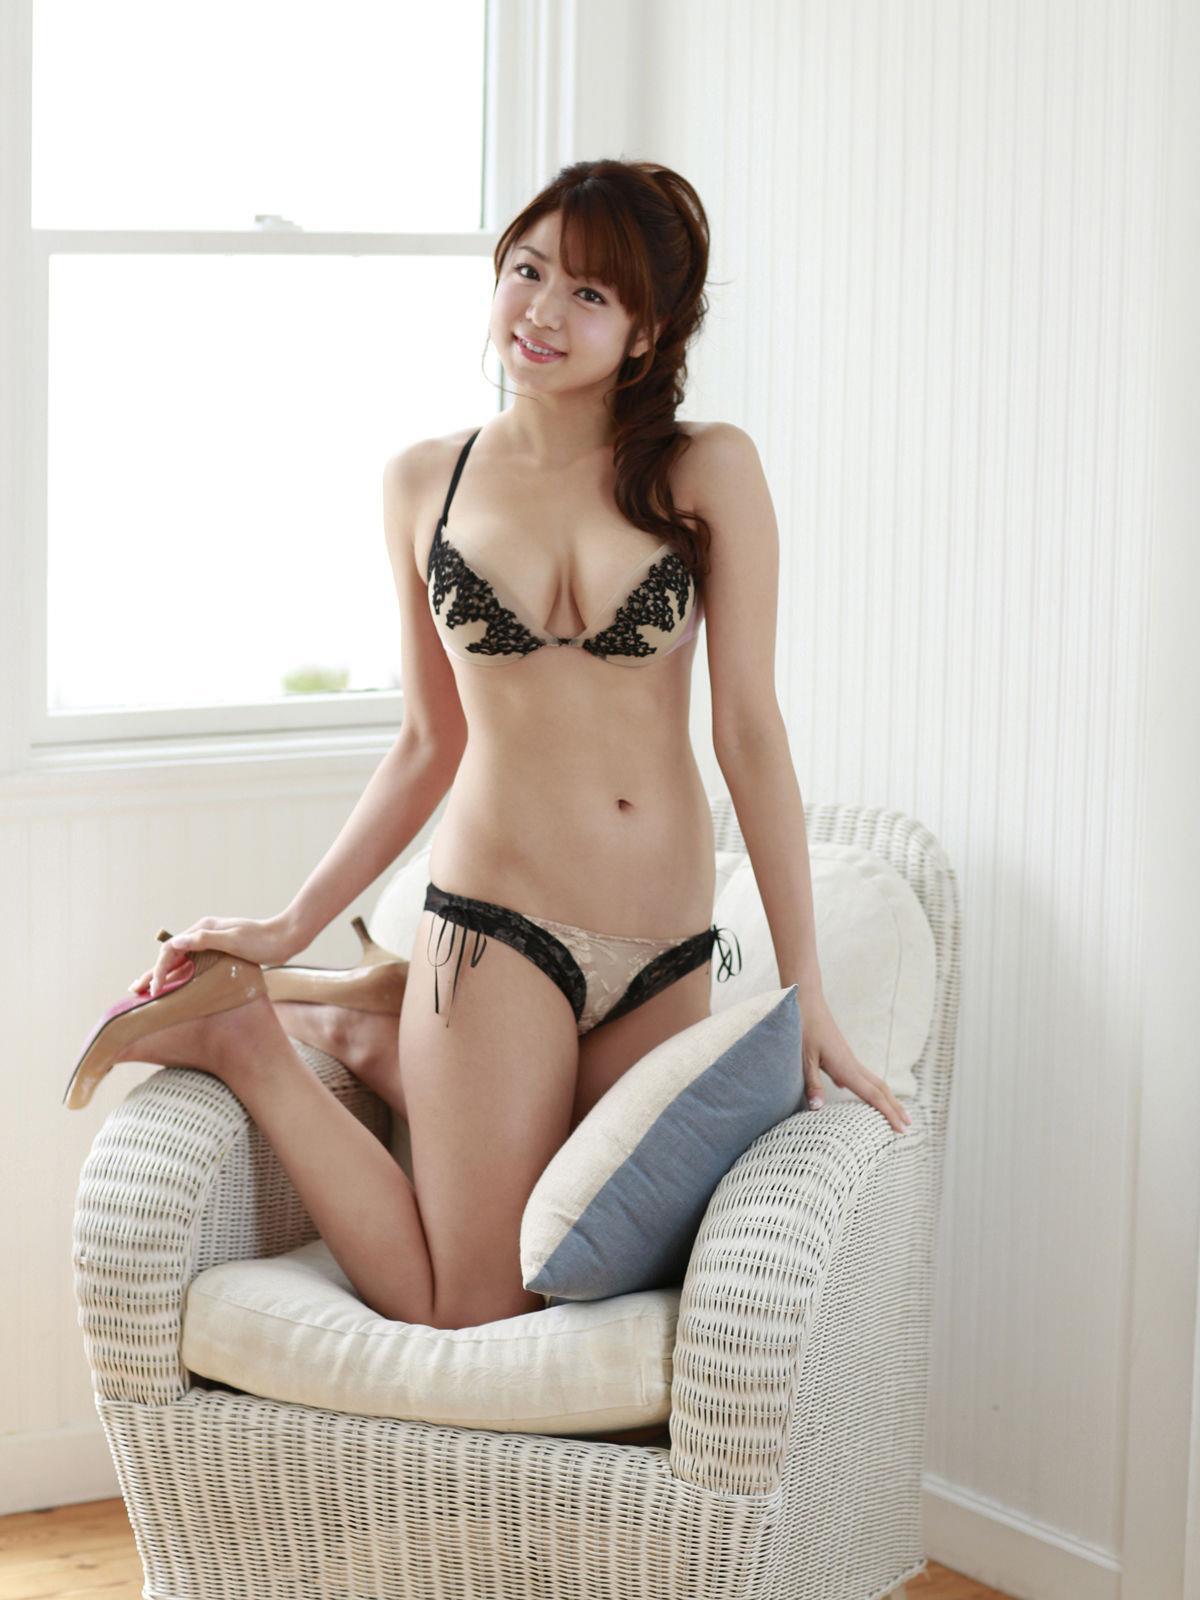 中村静香 画像 47